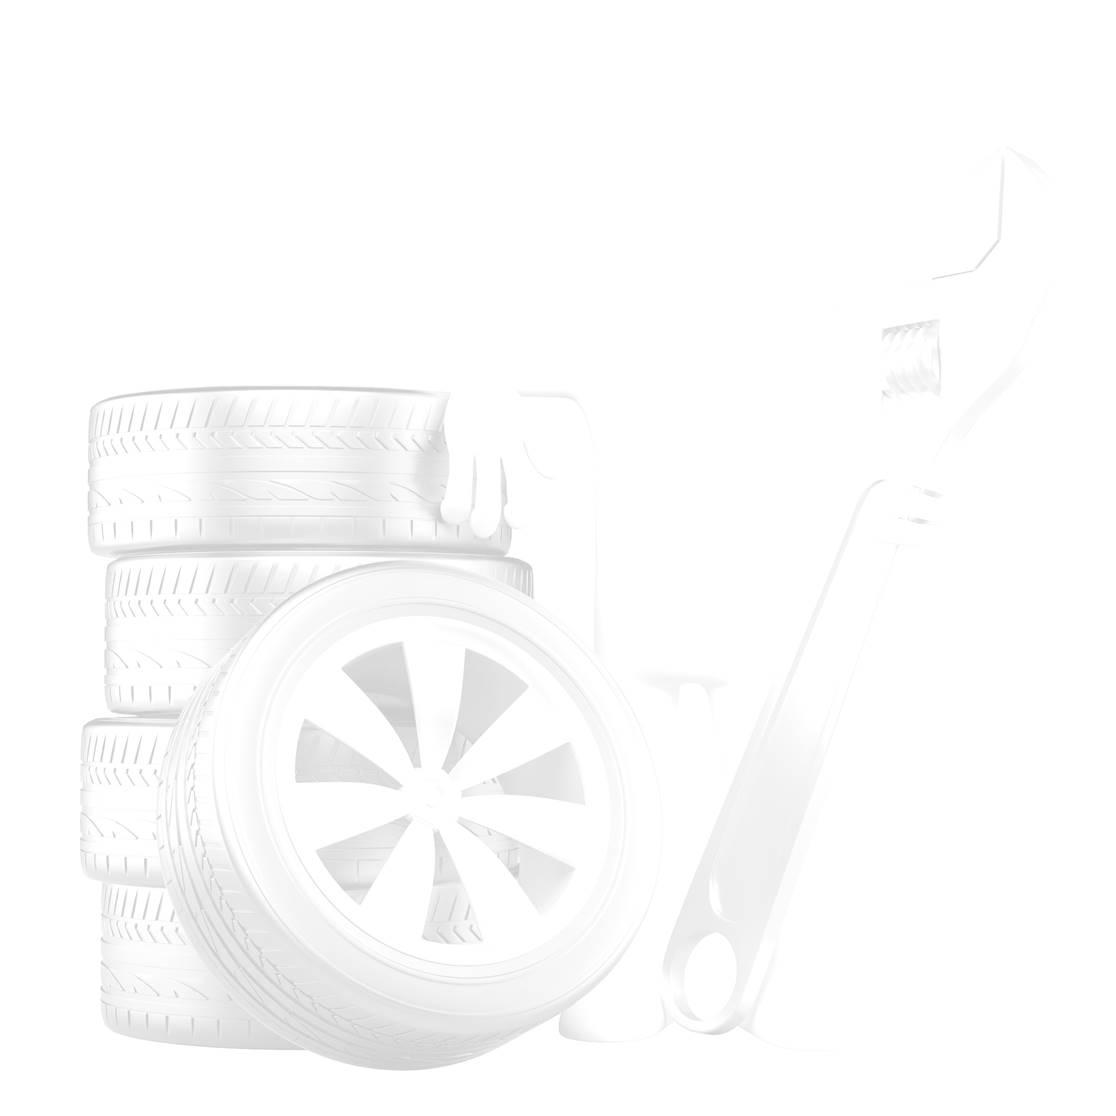 http://auto-ok.pl/pl-PL/files/14017937_l.jpg